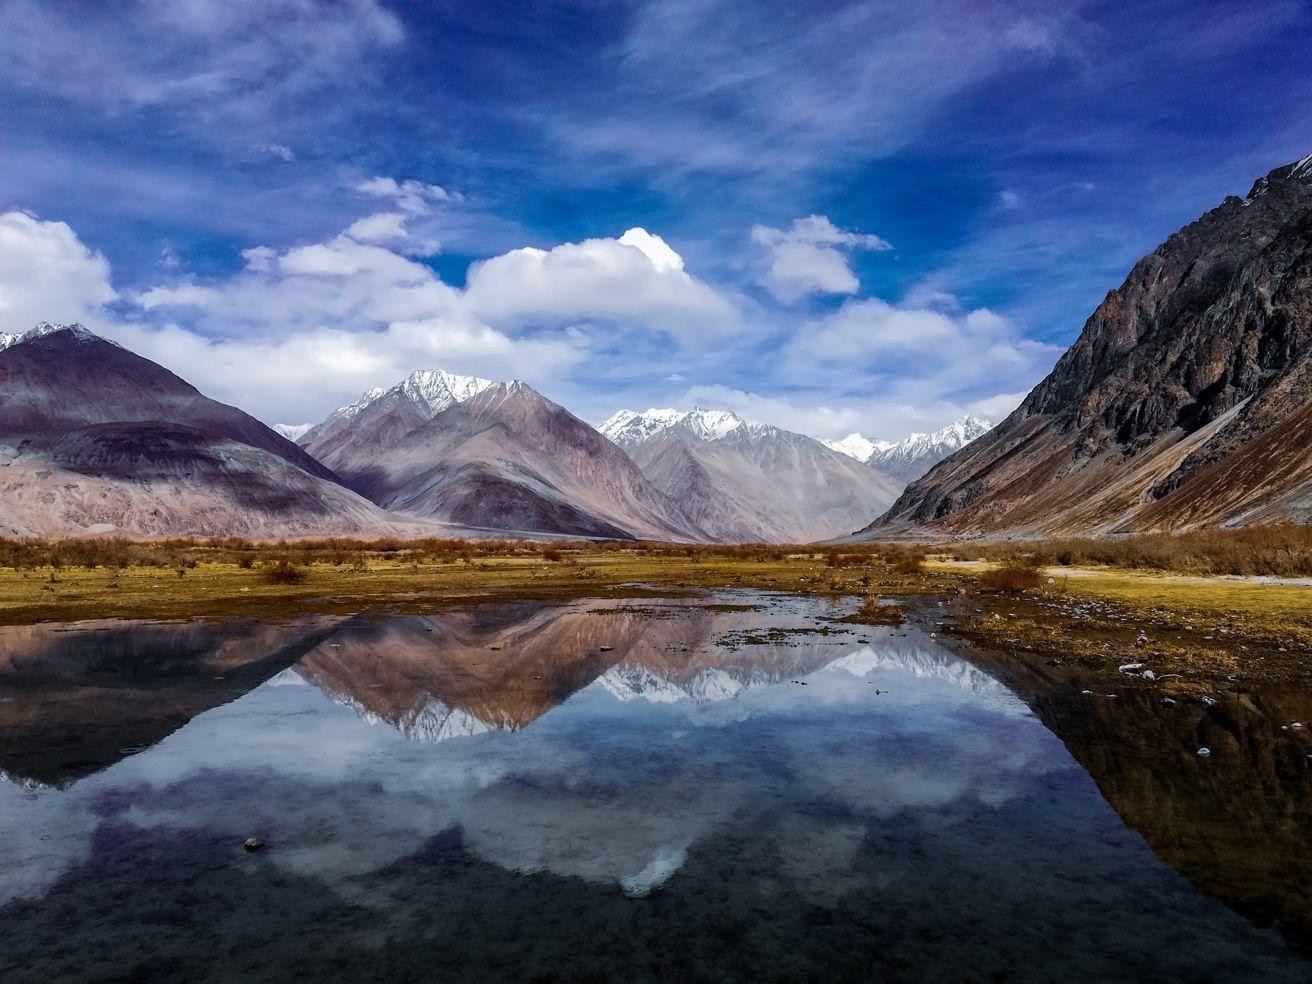 Photo of Nubra Valley By Vasu Devan M